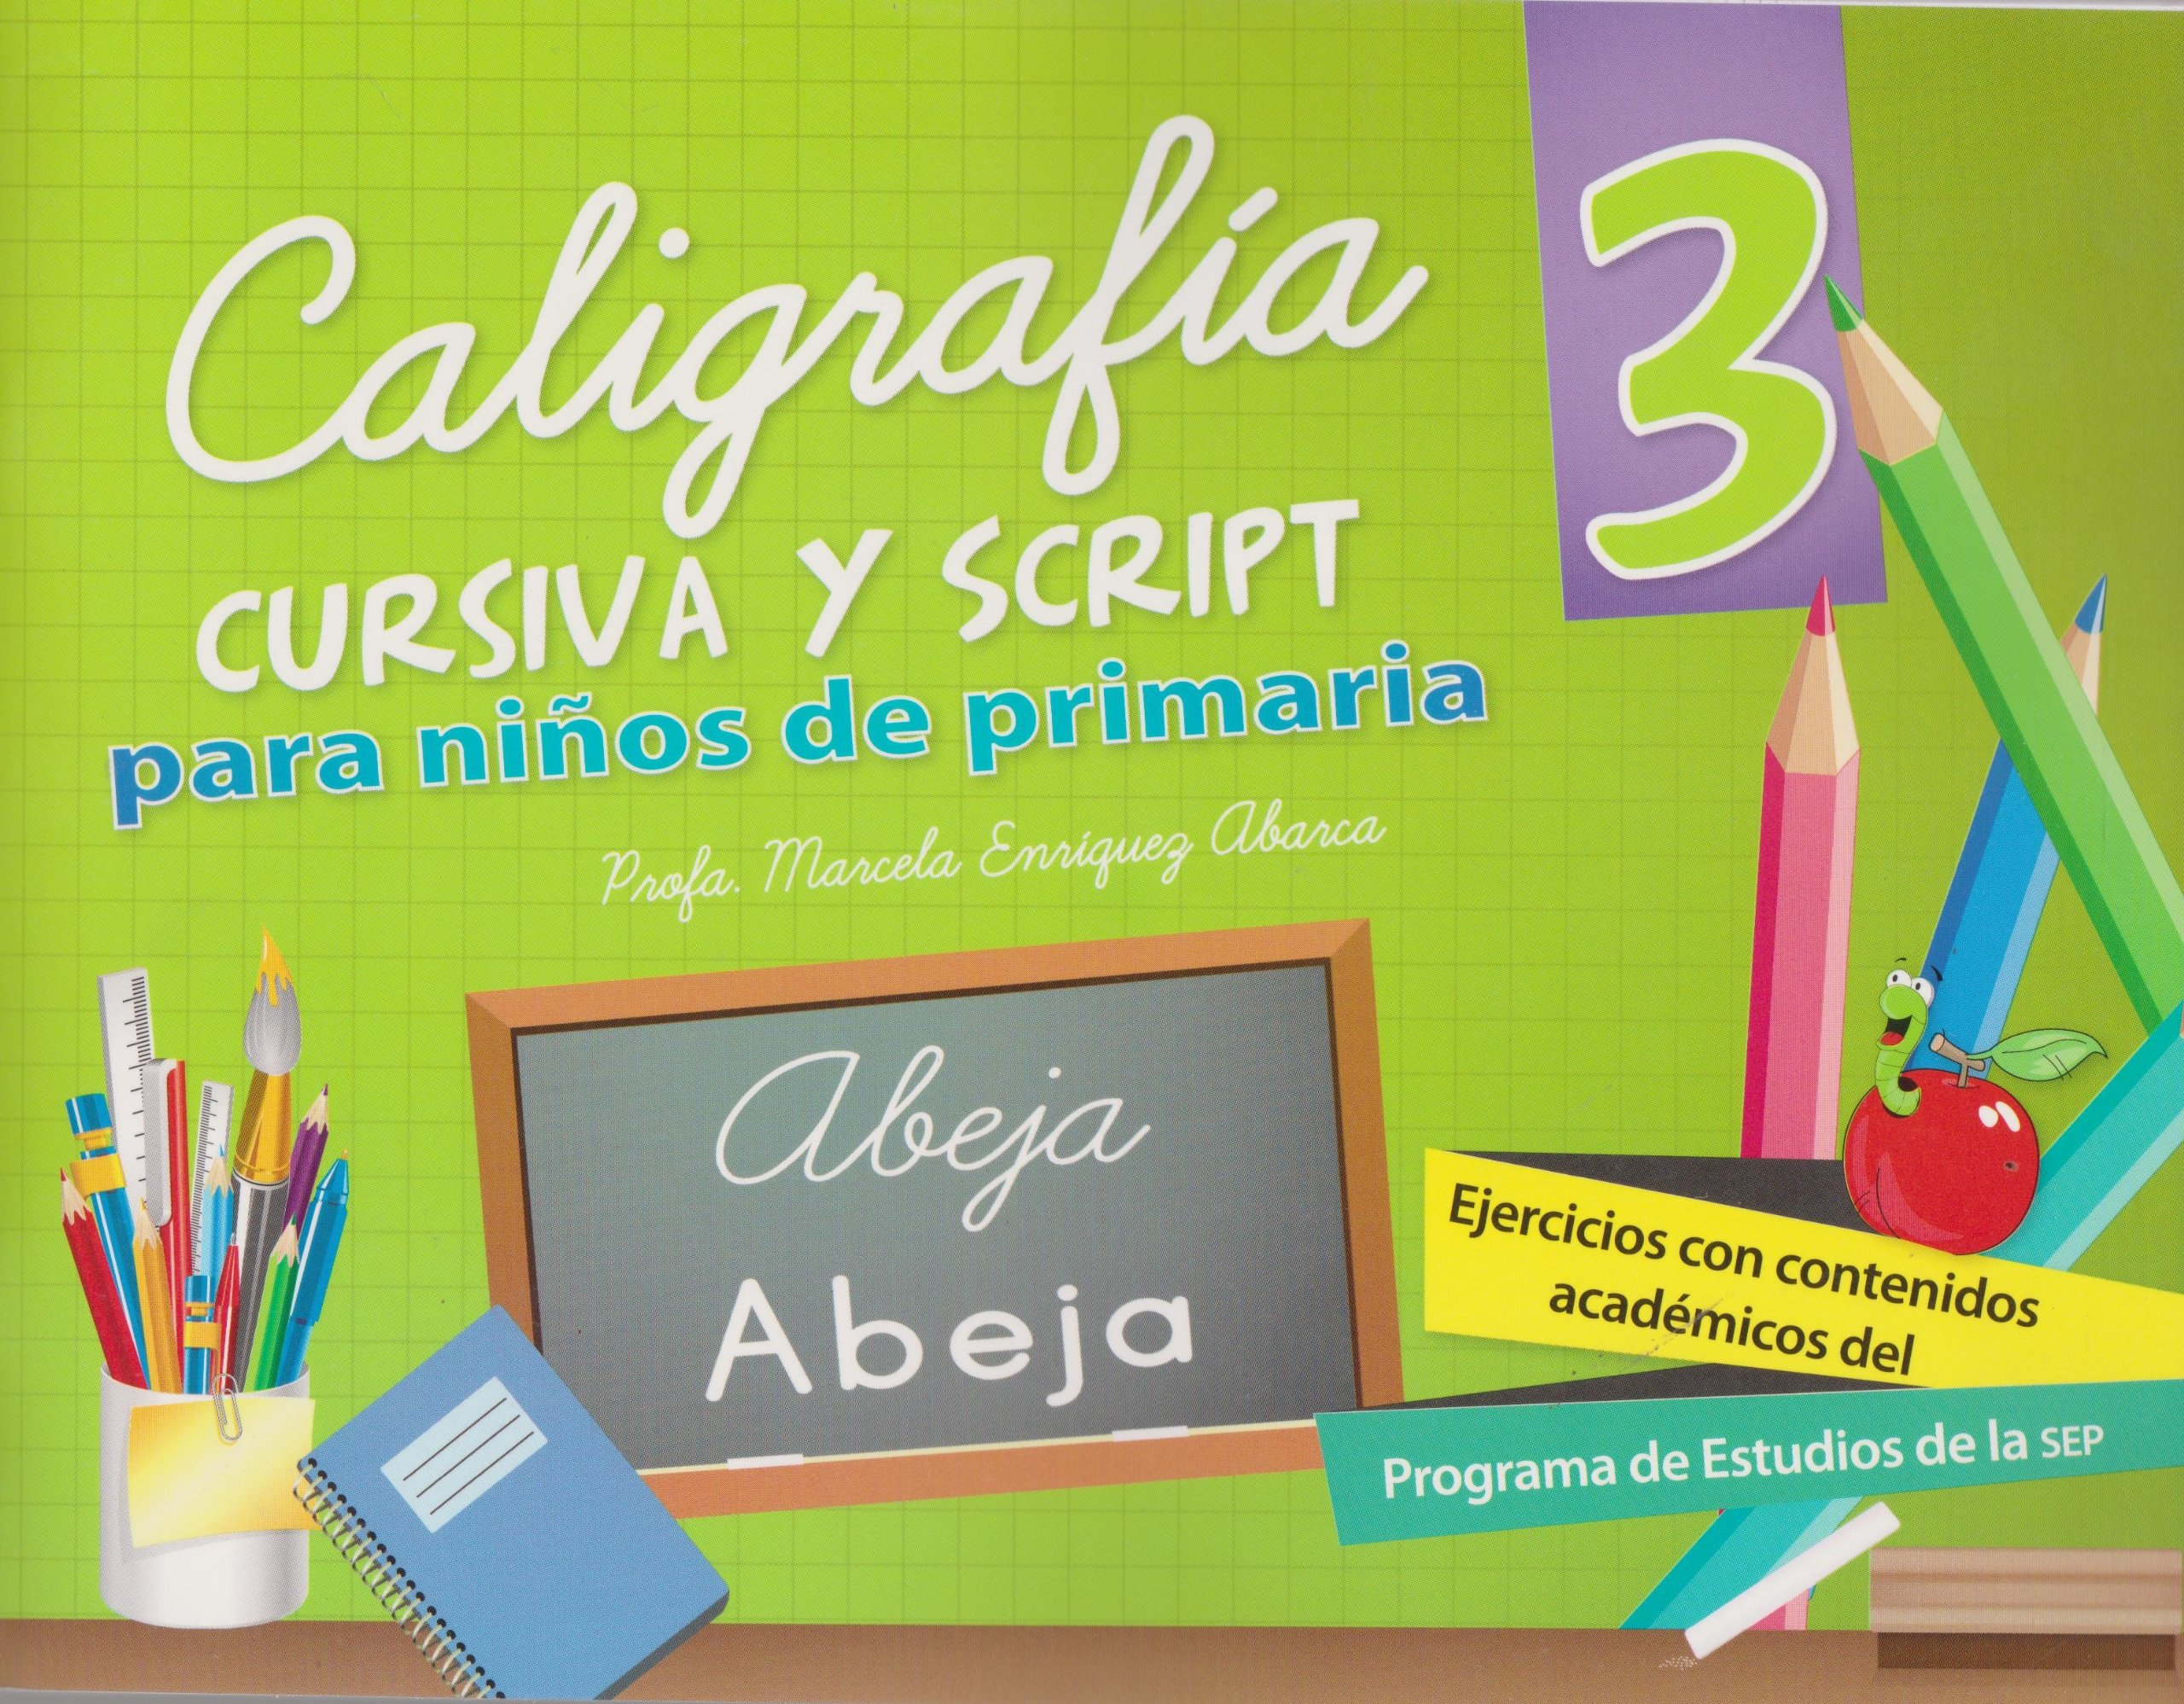 Caligrafia cursiva y script 3 para ninos de primaria (Spanish Edition) (Spanish) Paperback – March 1, 2012